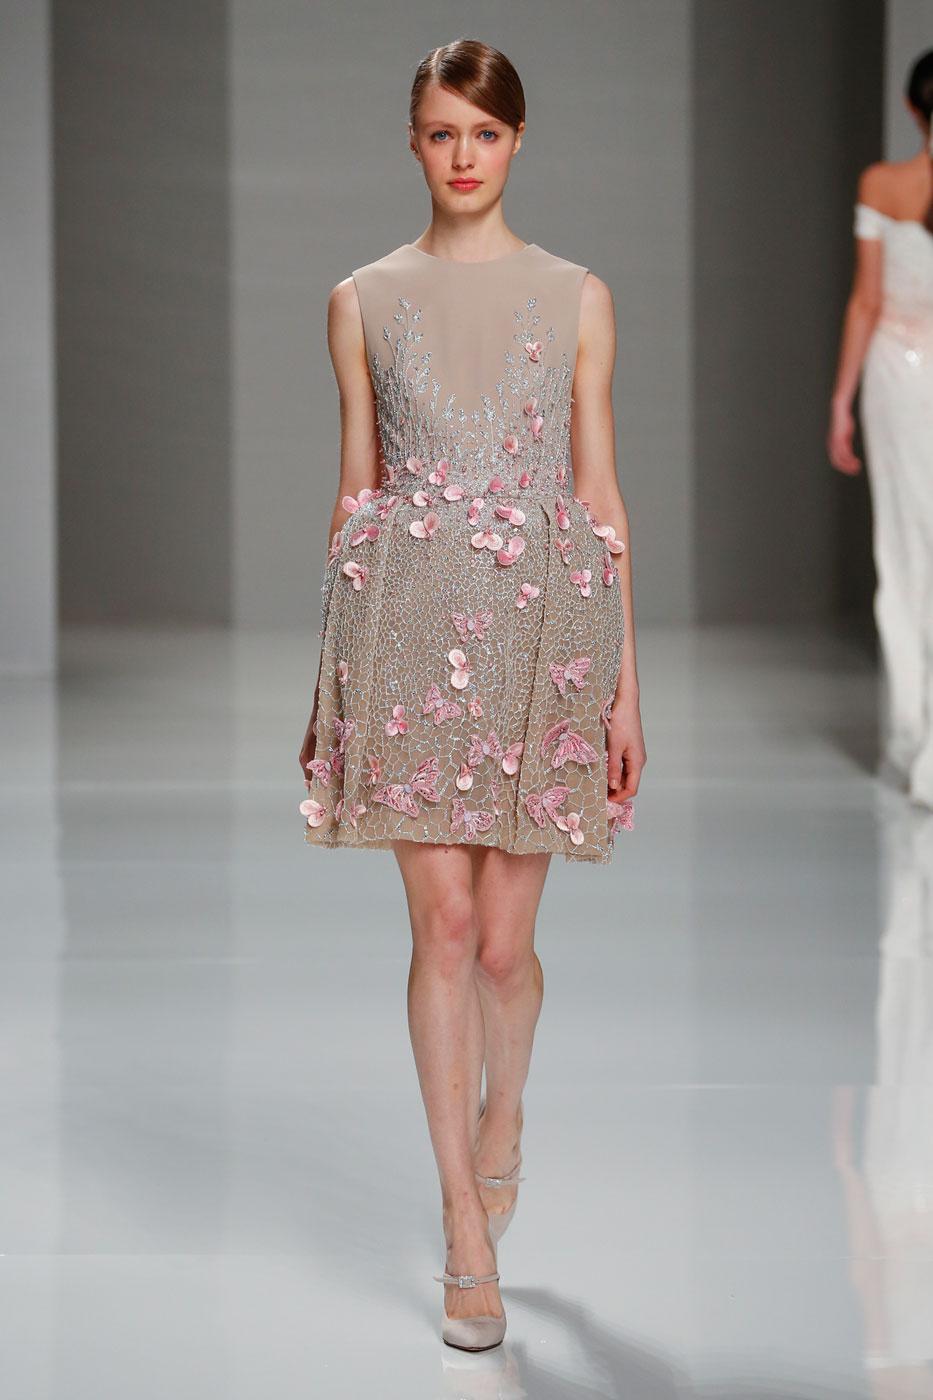 Georges-Hobeika-fashion-runway-show-haute-couture-paris-spring-2015-the-impression-49